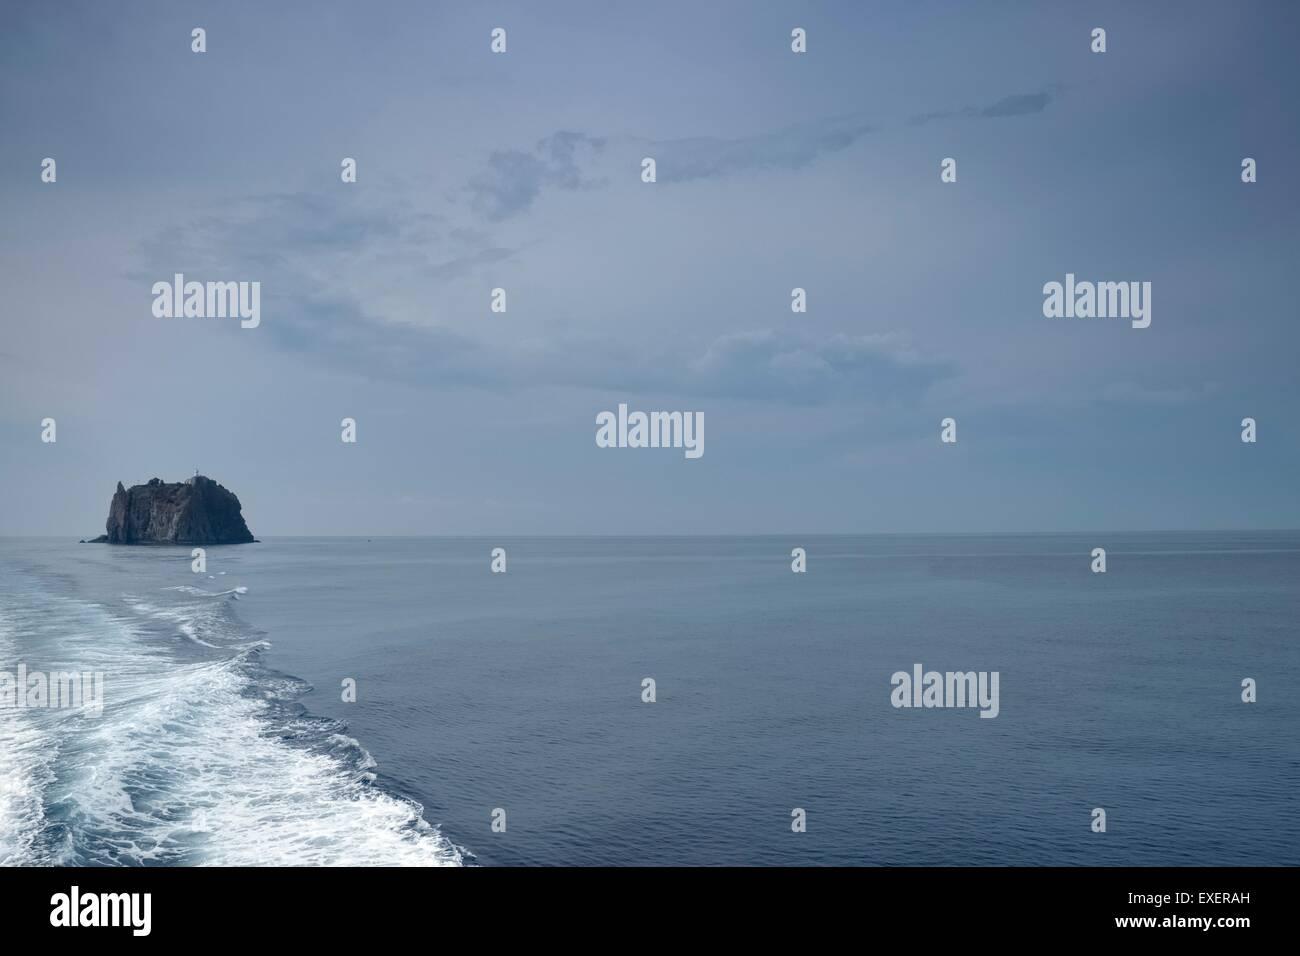 Aeolian Islands Tyrrhenian Sea, Sicily: Views of Stromboli : Strombolichio Island - Stock Image